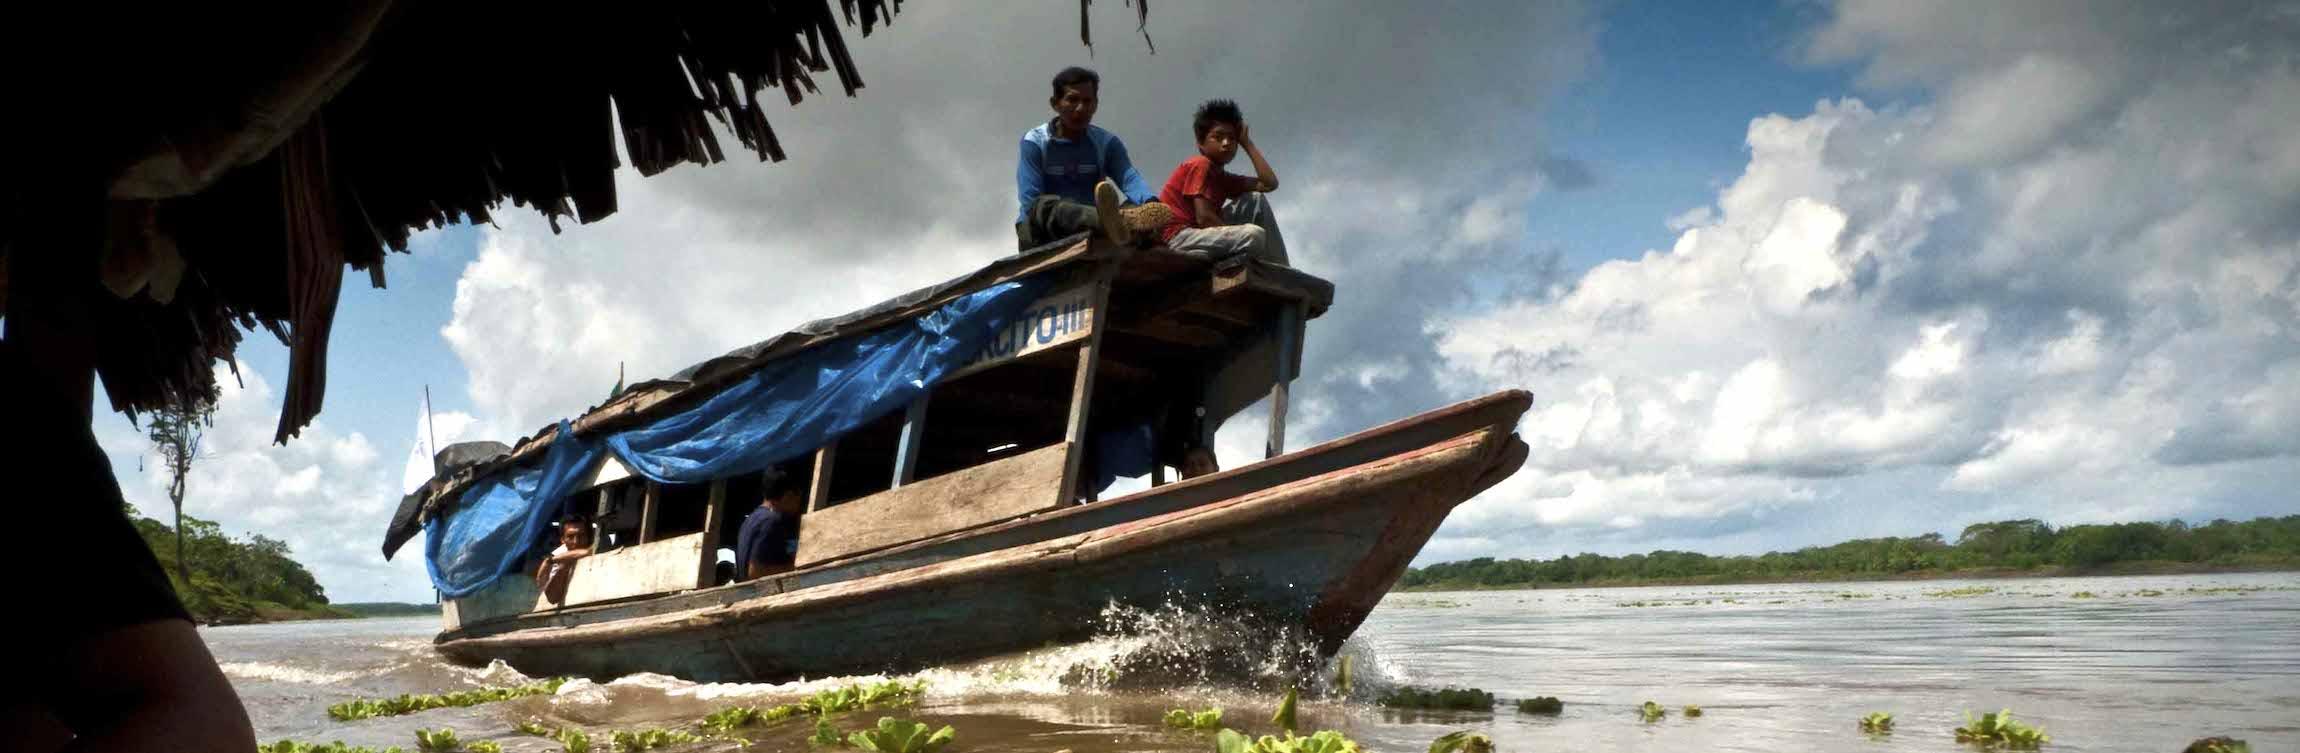 IN AMAZZONIA, RESPONSABILMENTE